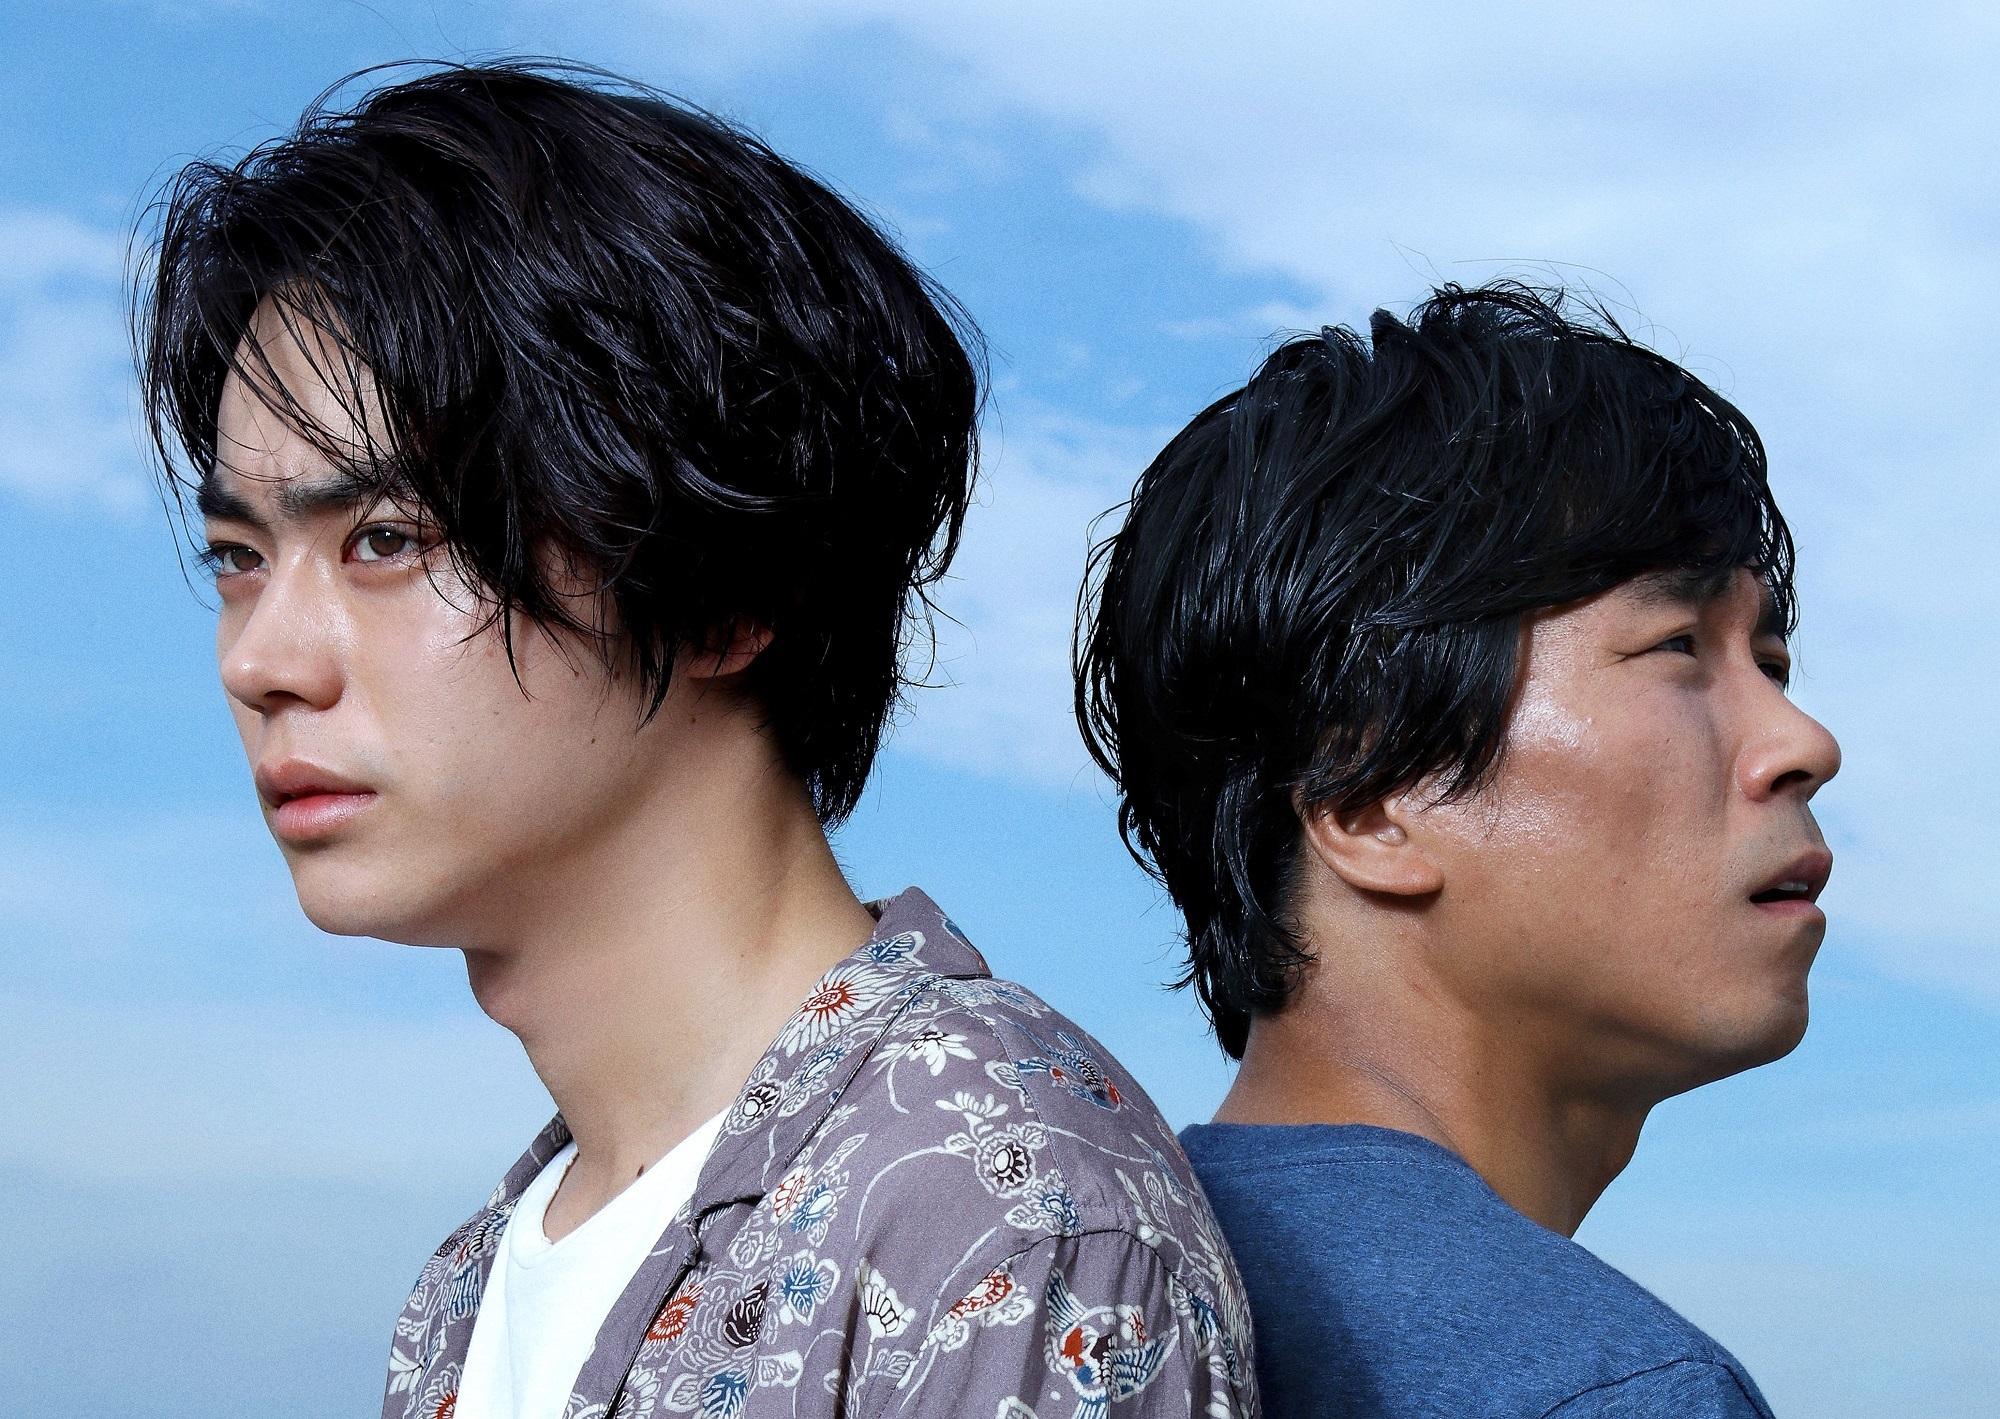 (C)2017『あゝ、荒野』フィルムパートナーズニオン